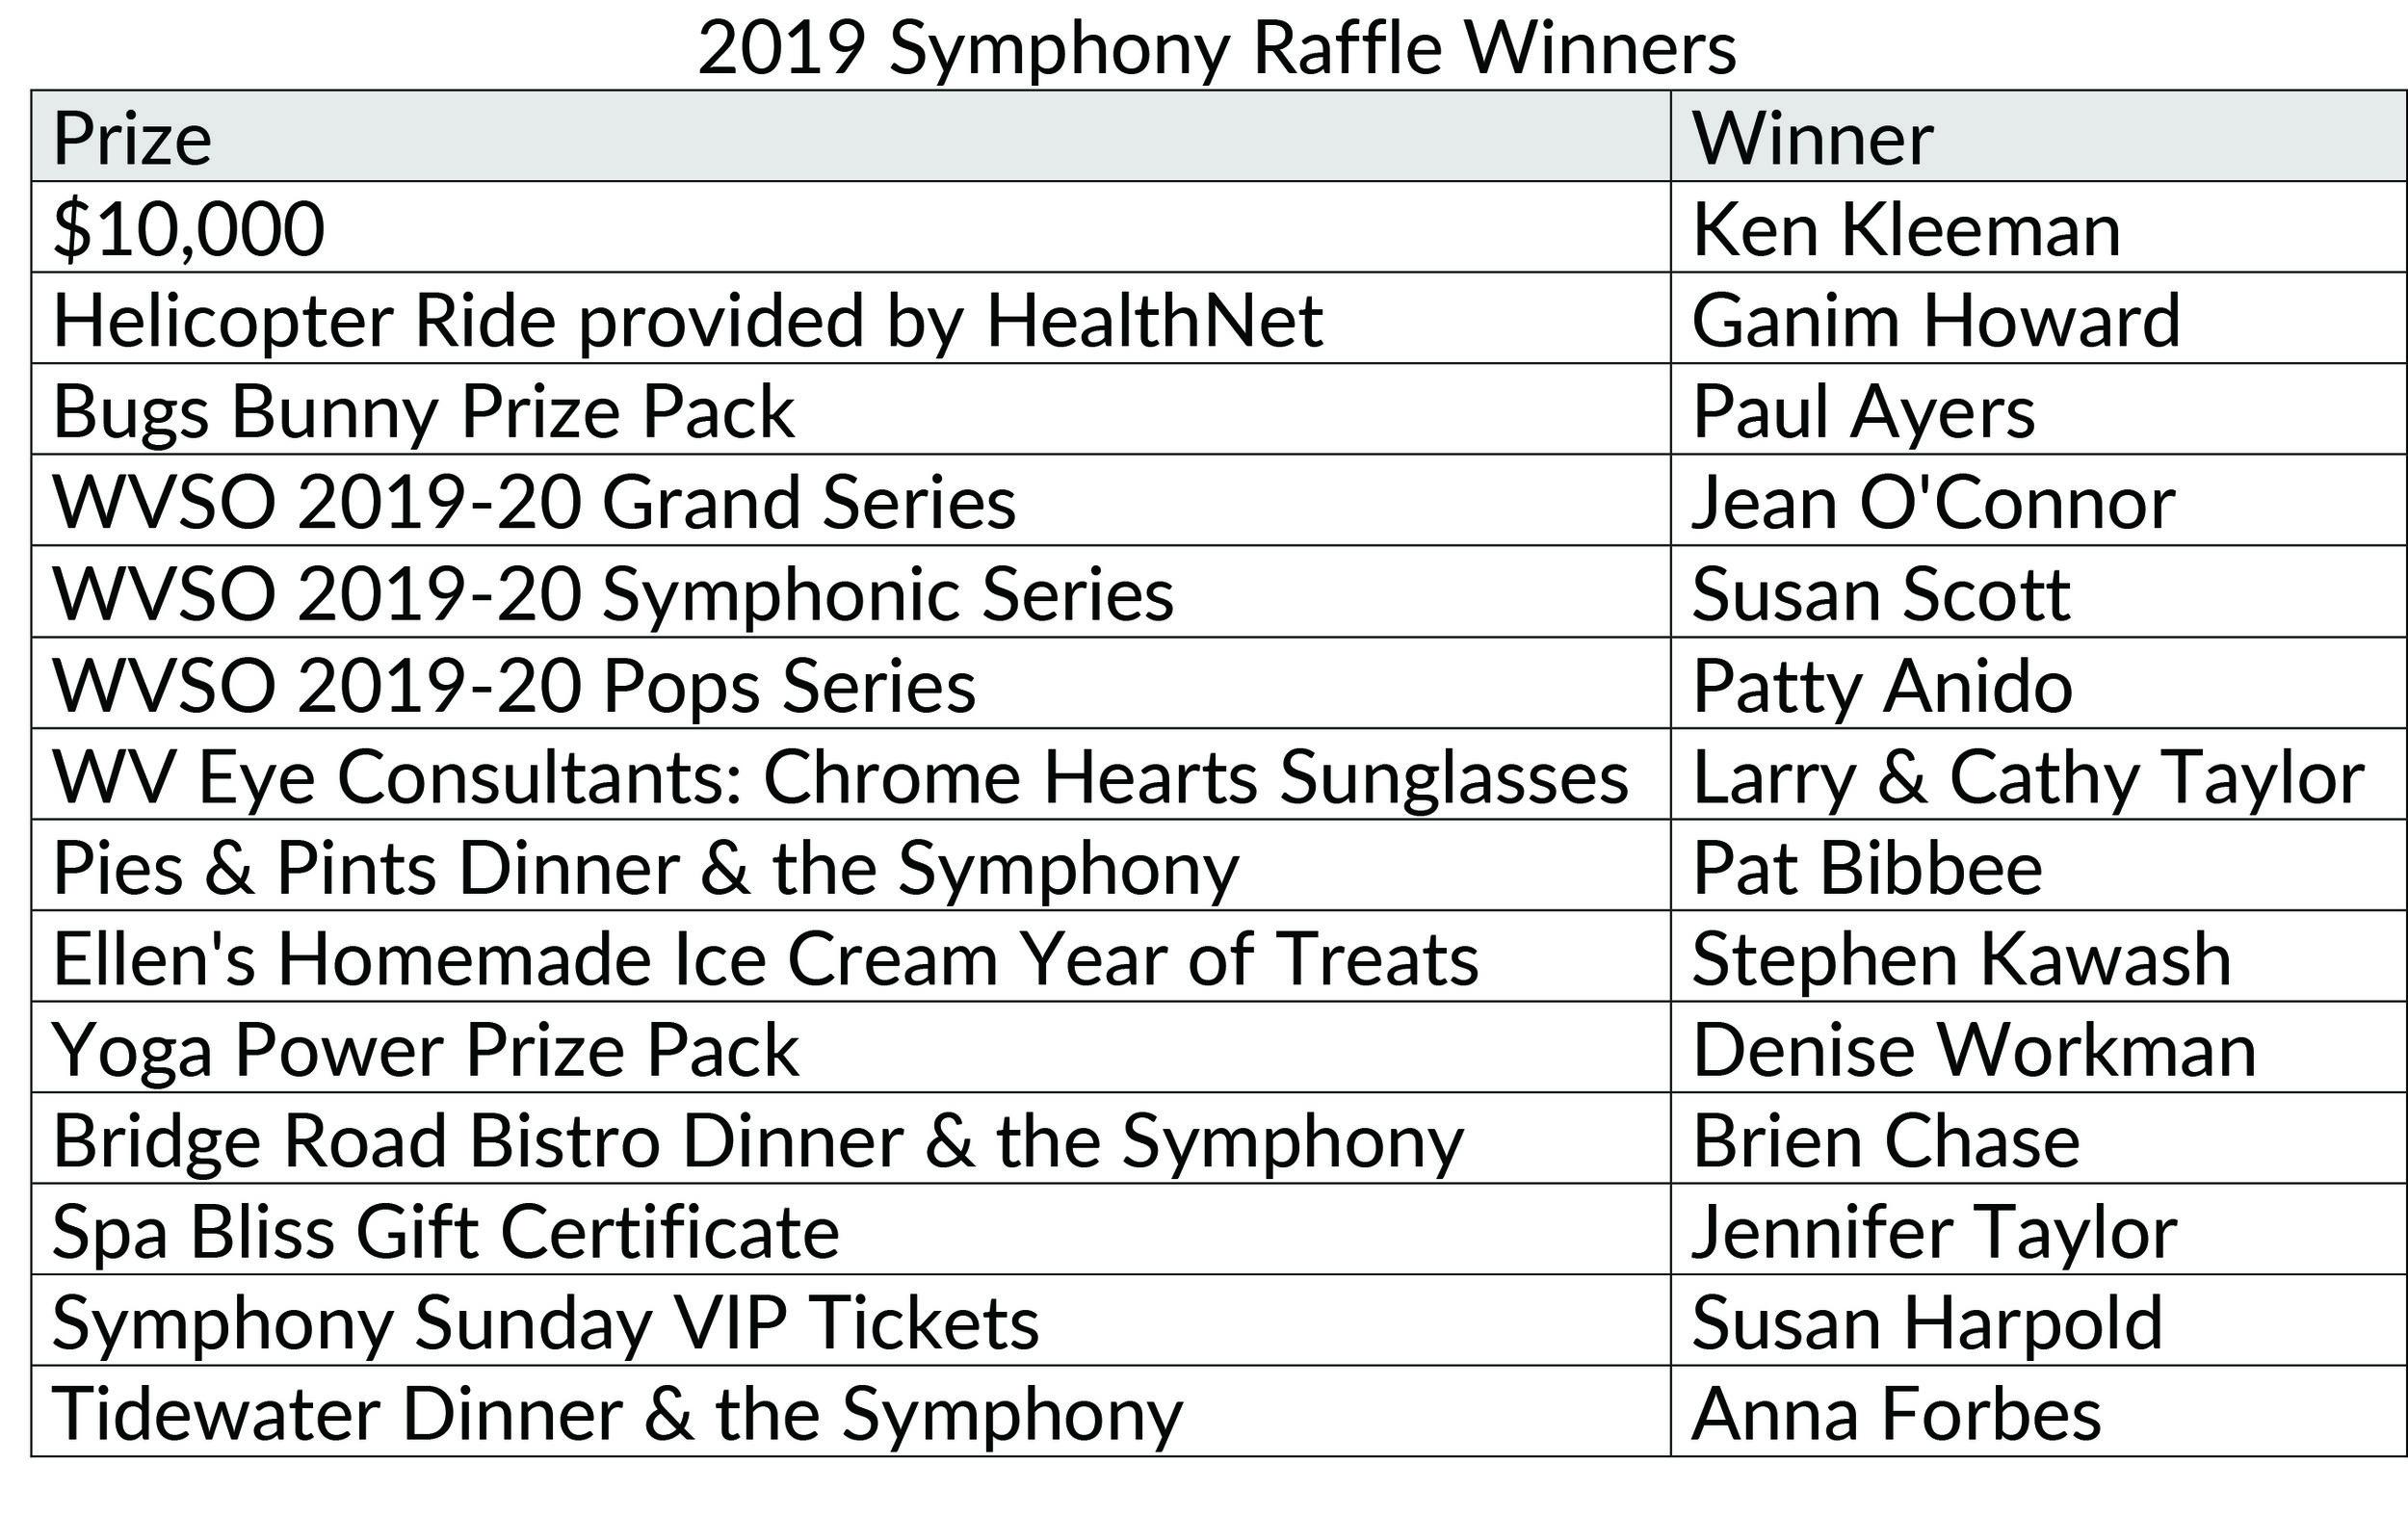 2019 Symphony Raffle Winners.jpg